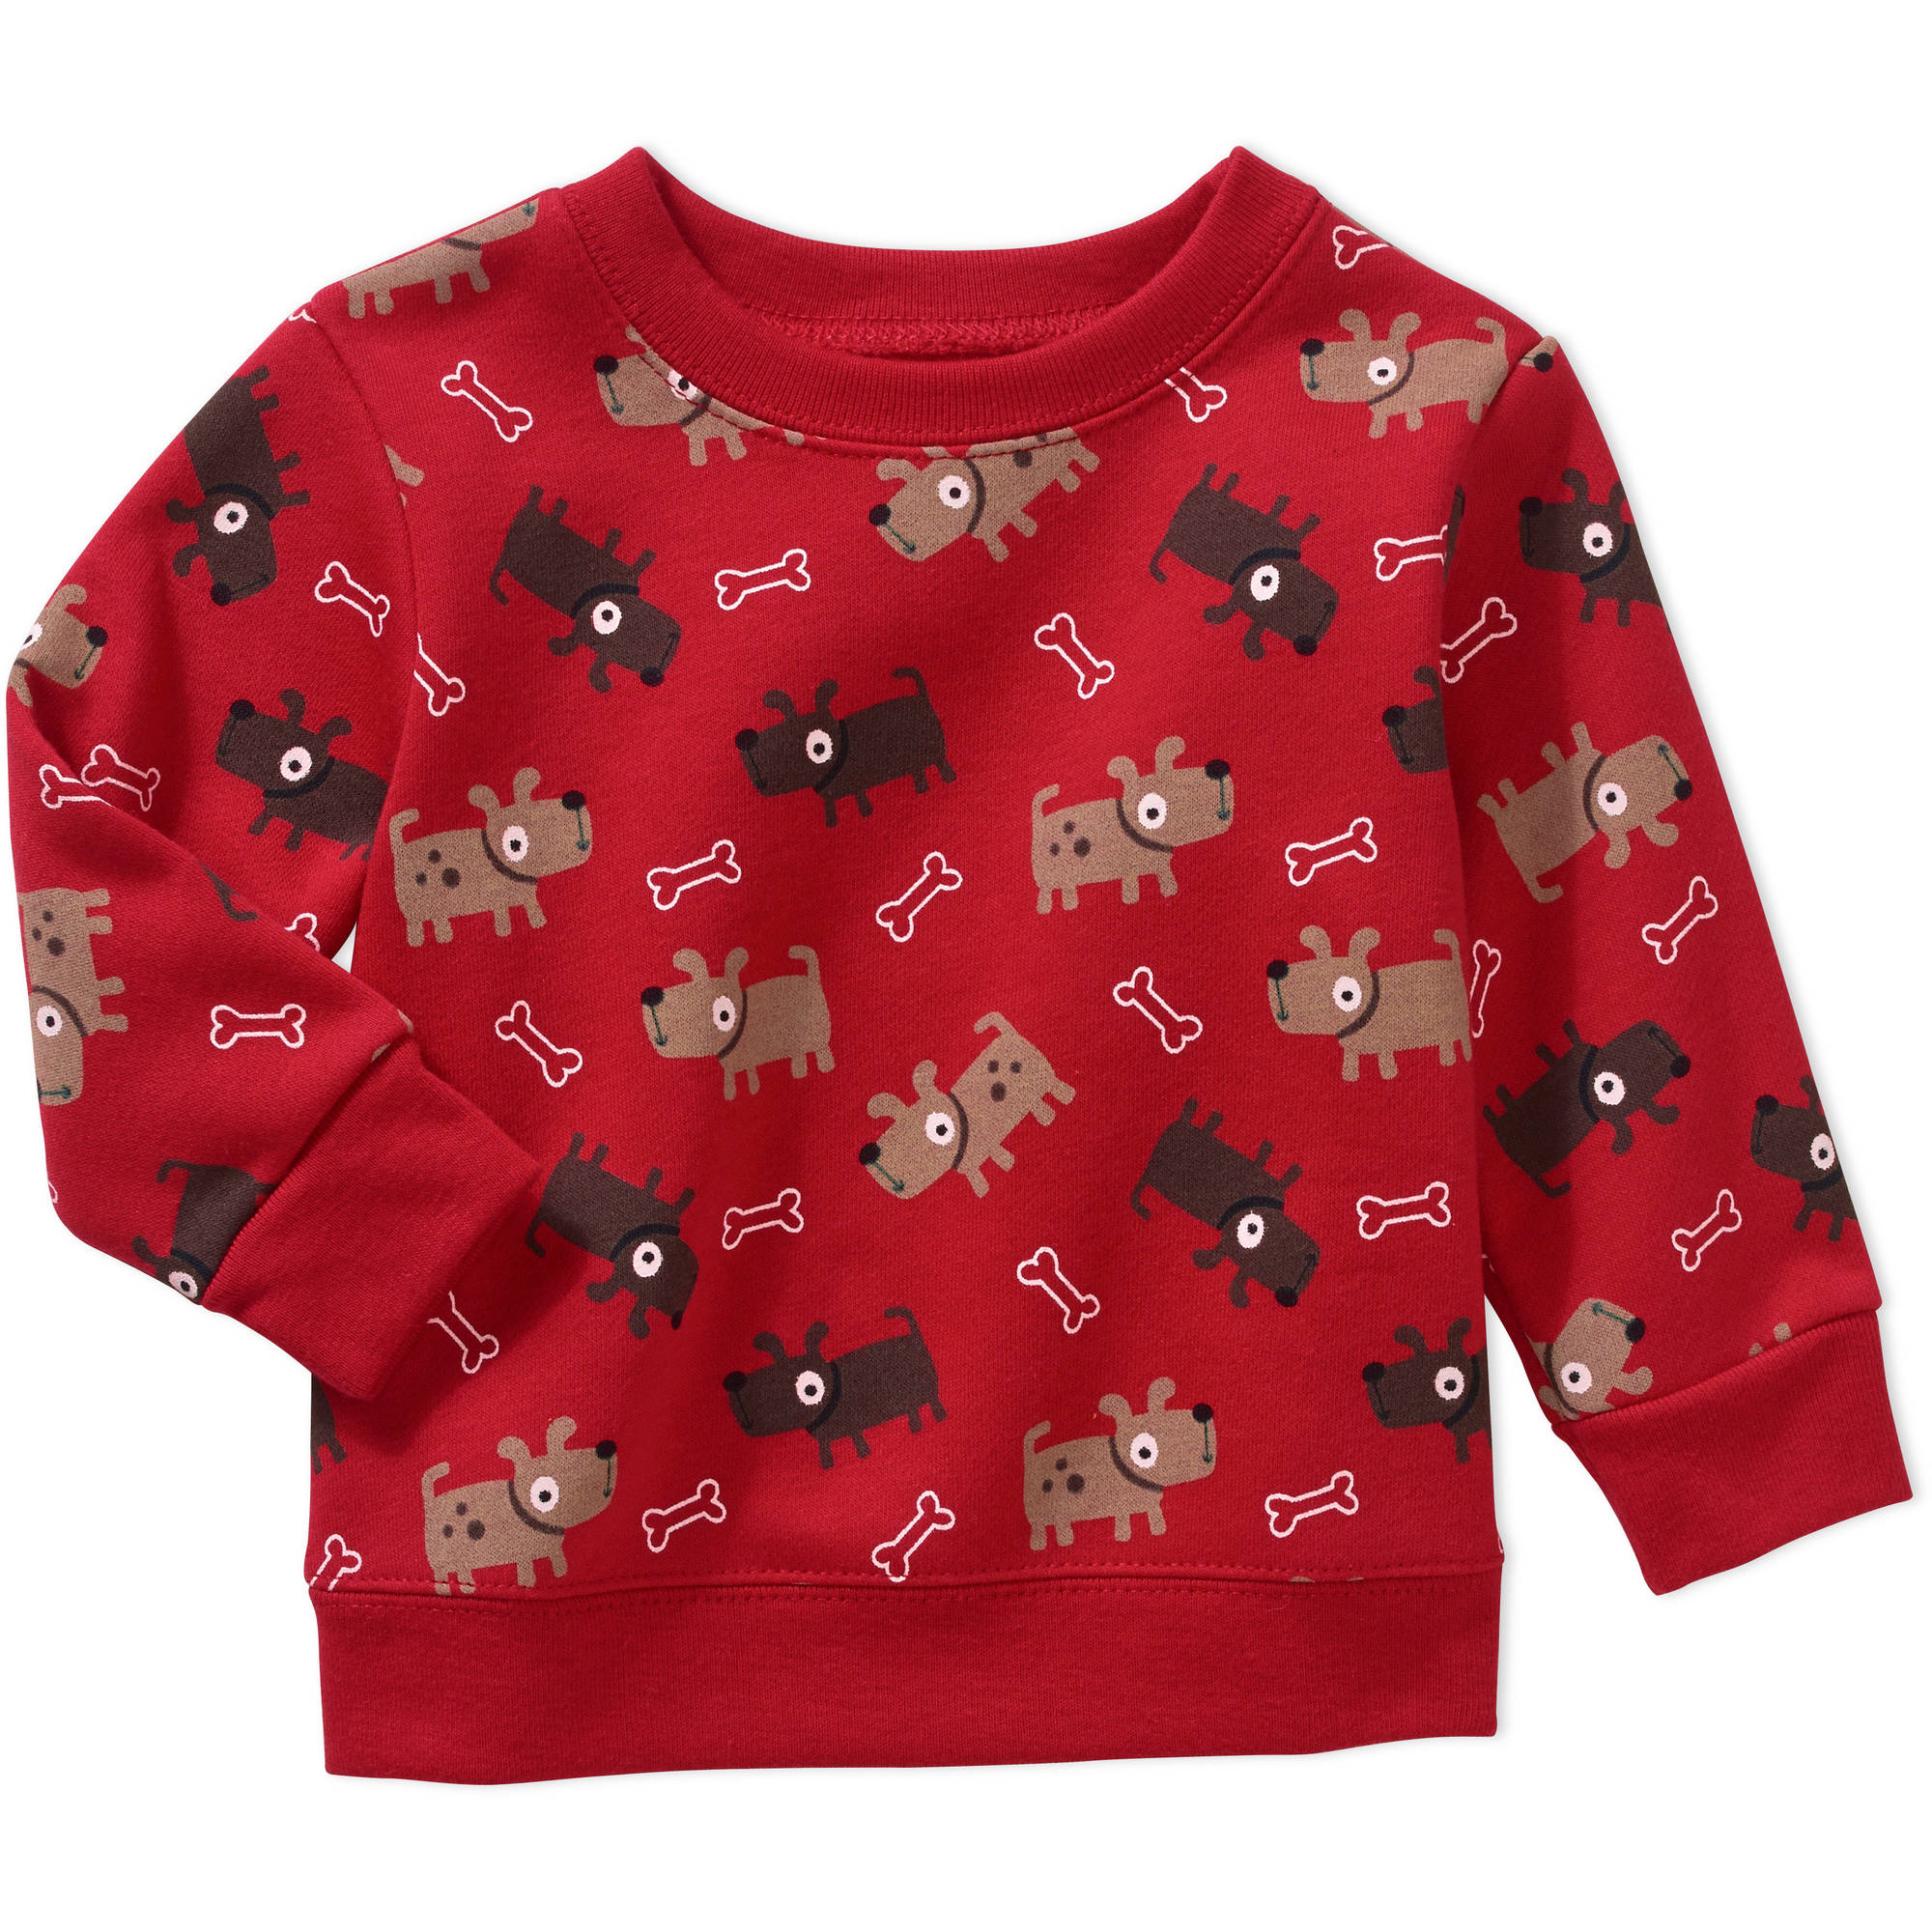 Garanimals Baby Boy Print Sweatshirt